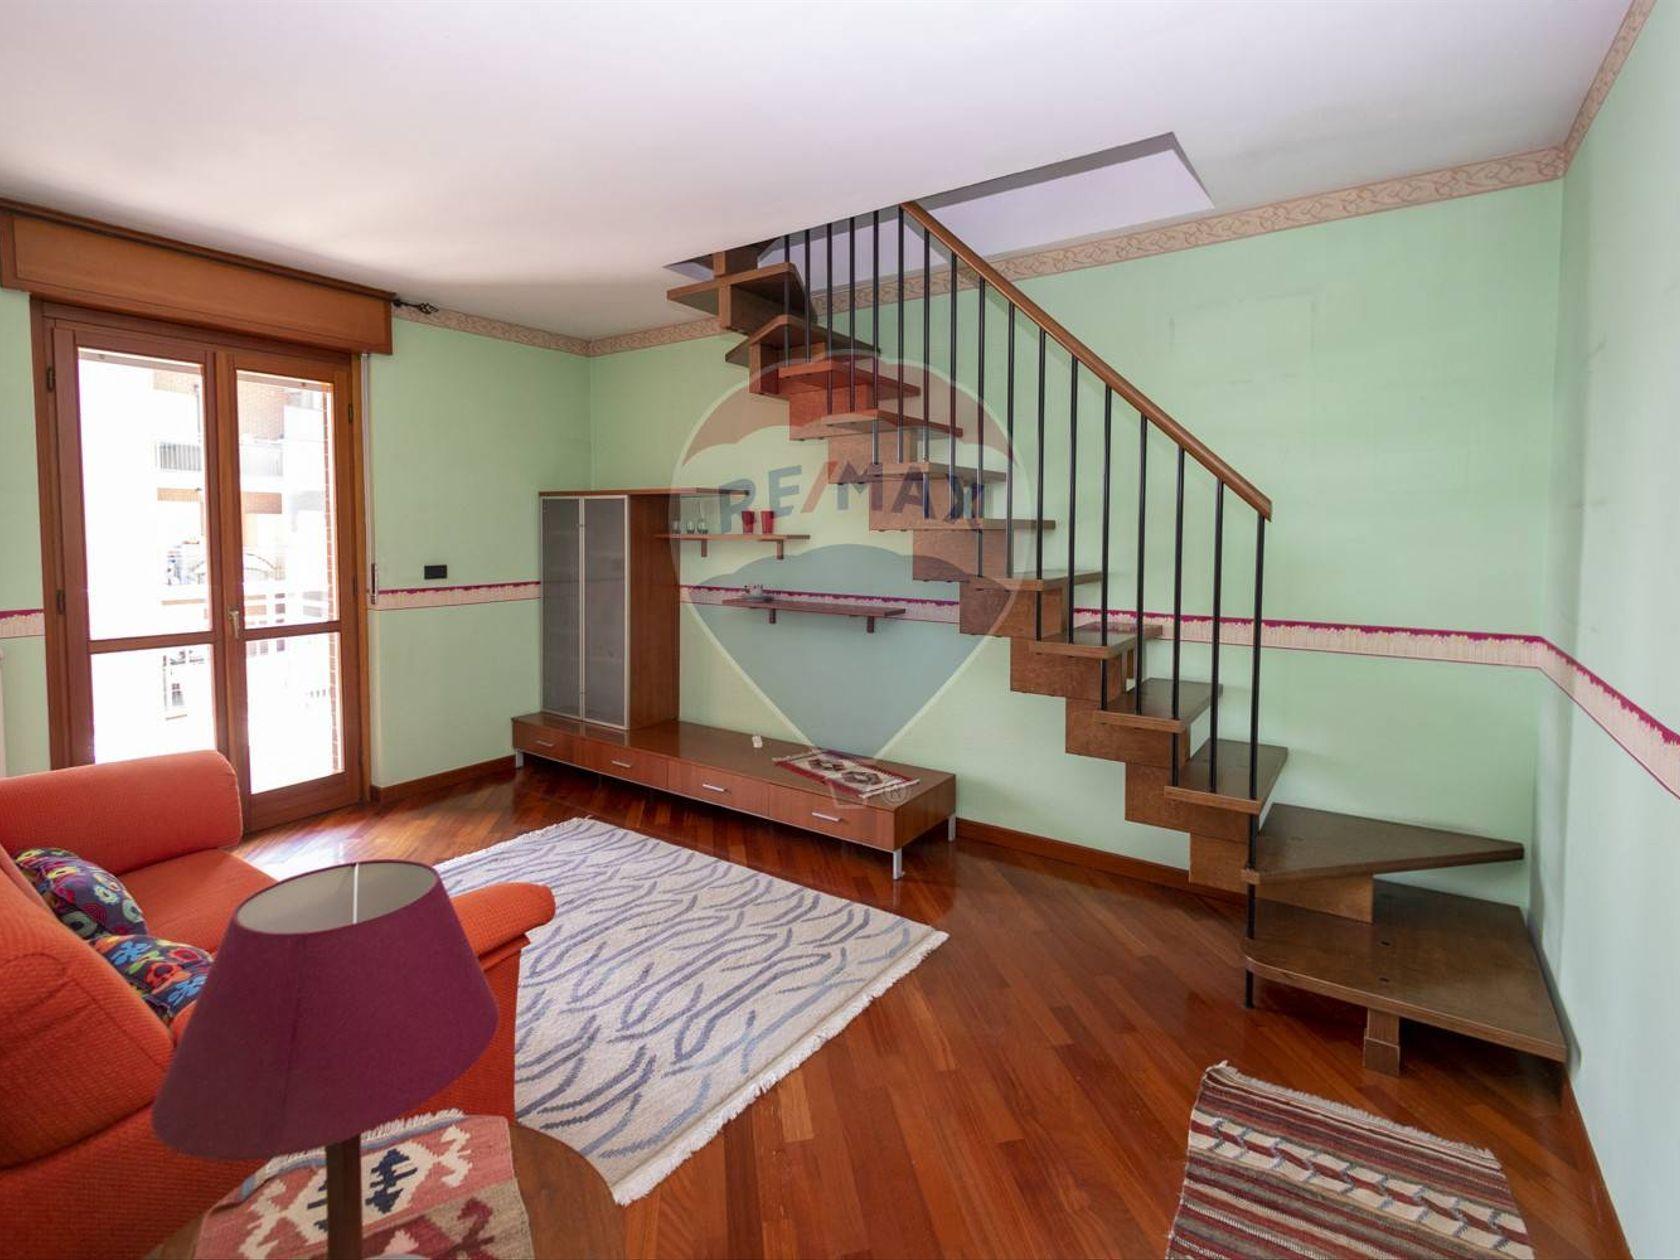 Appartamento Lucento, Torino, TO Vendita - Foto 3